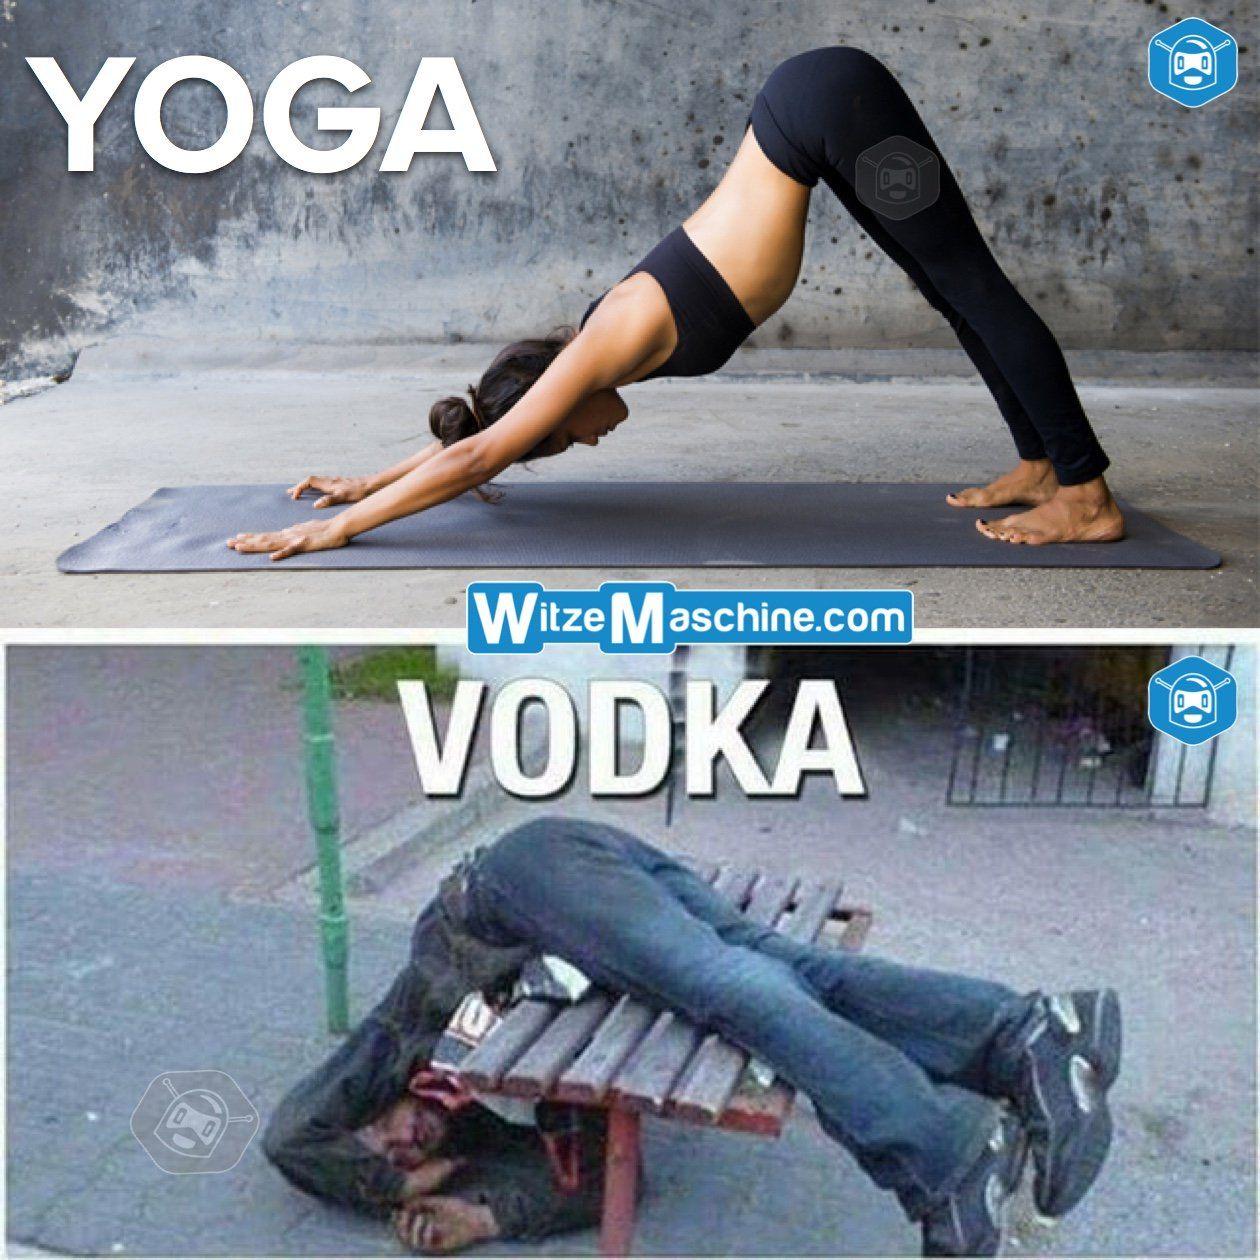 Verwechslung Yoga Vodka Russen Witze Lustig Witze Witzig